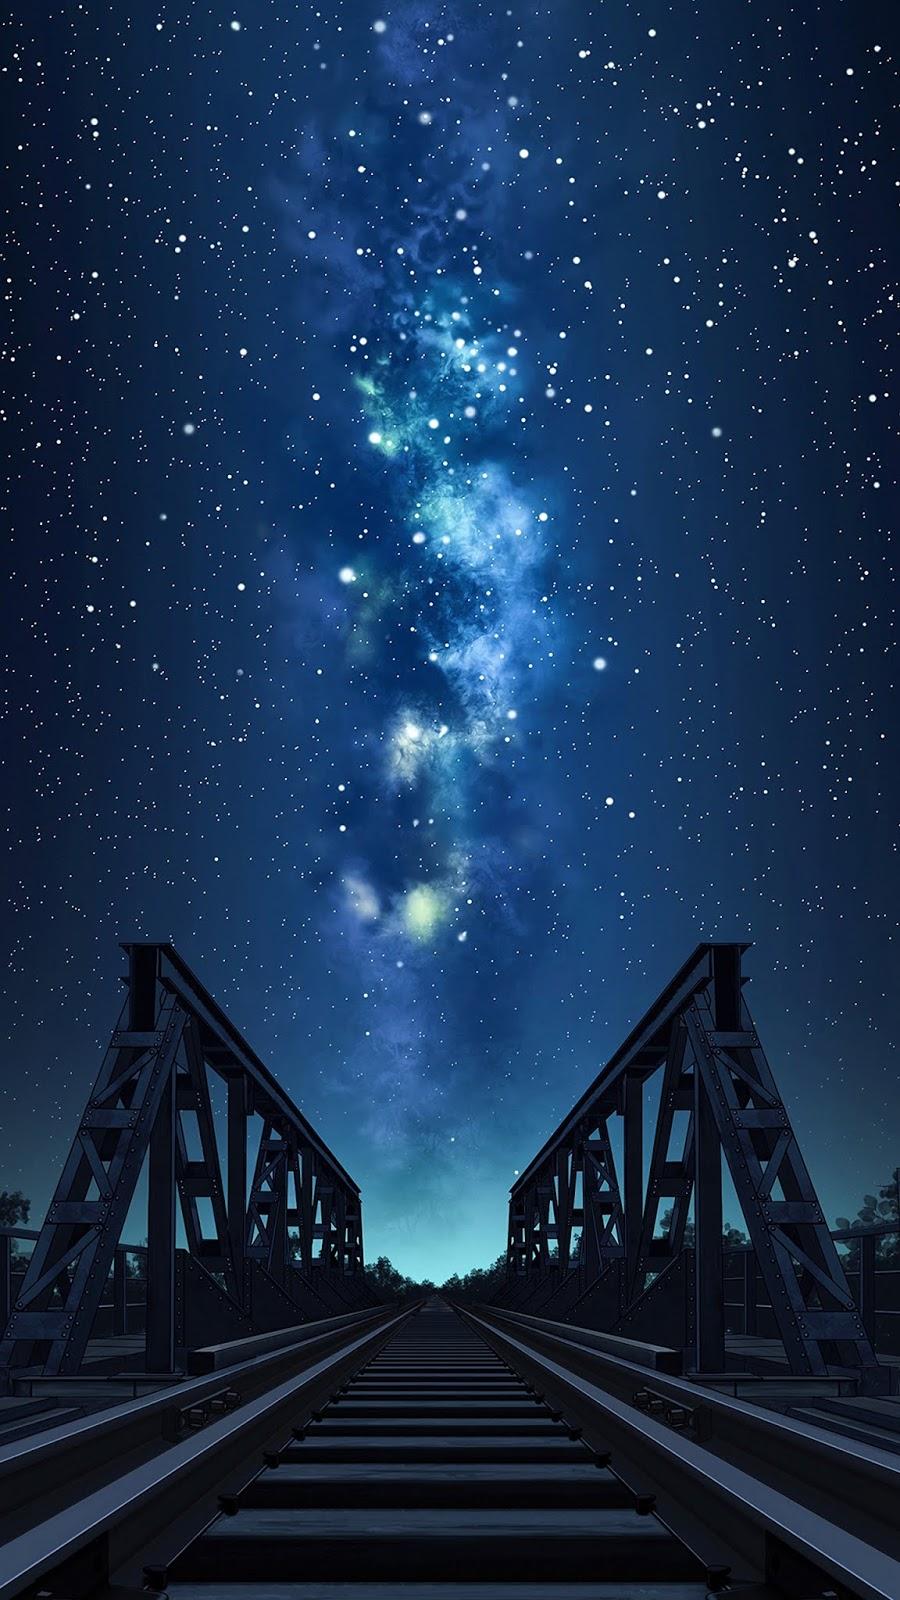 Starry night under the bridge